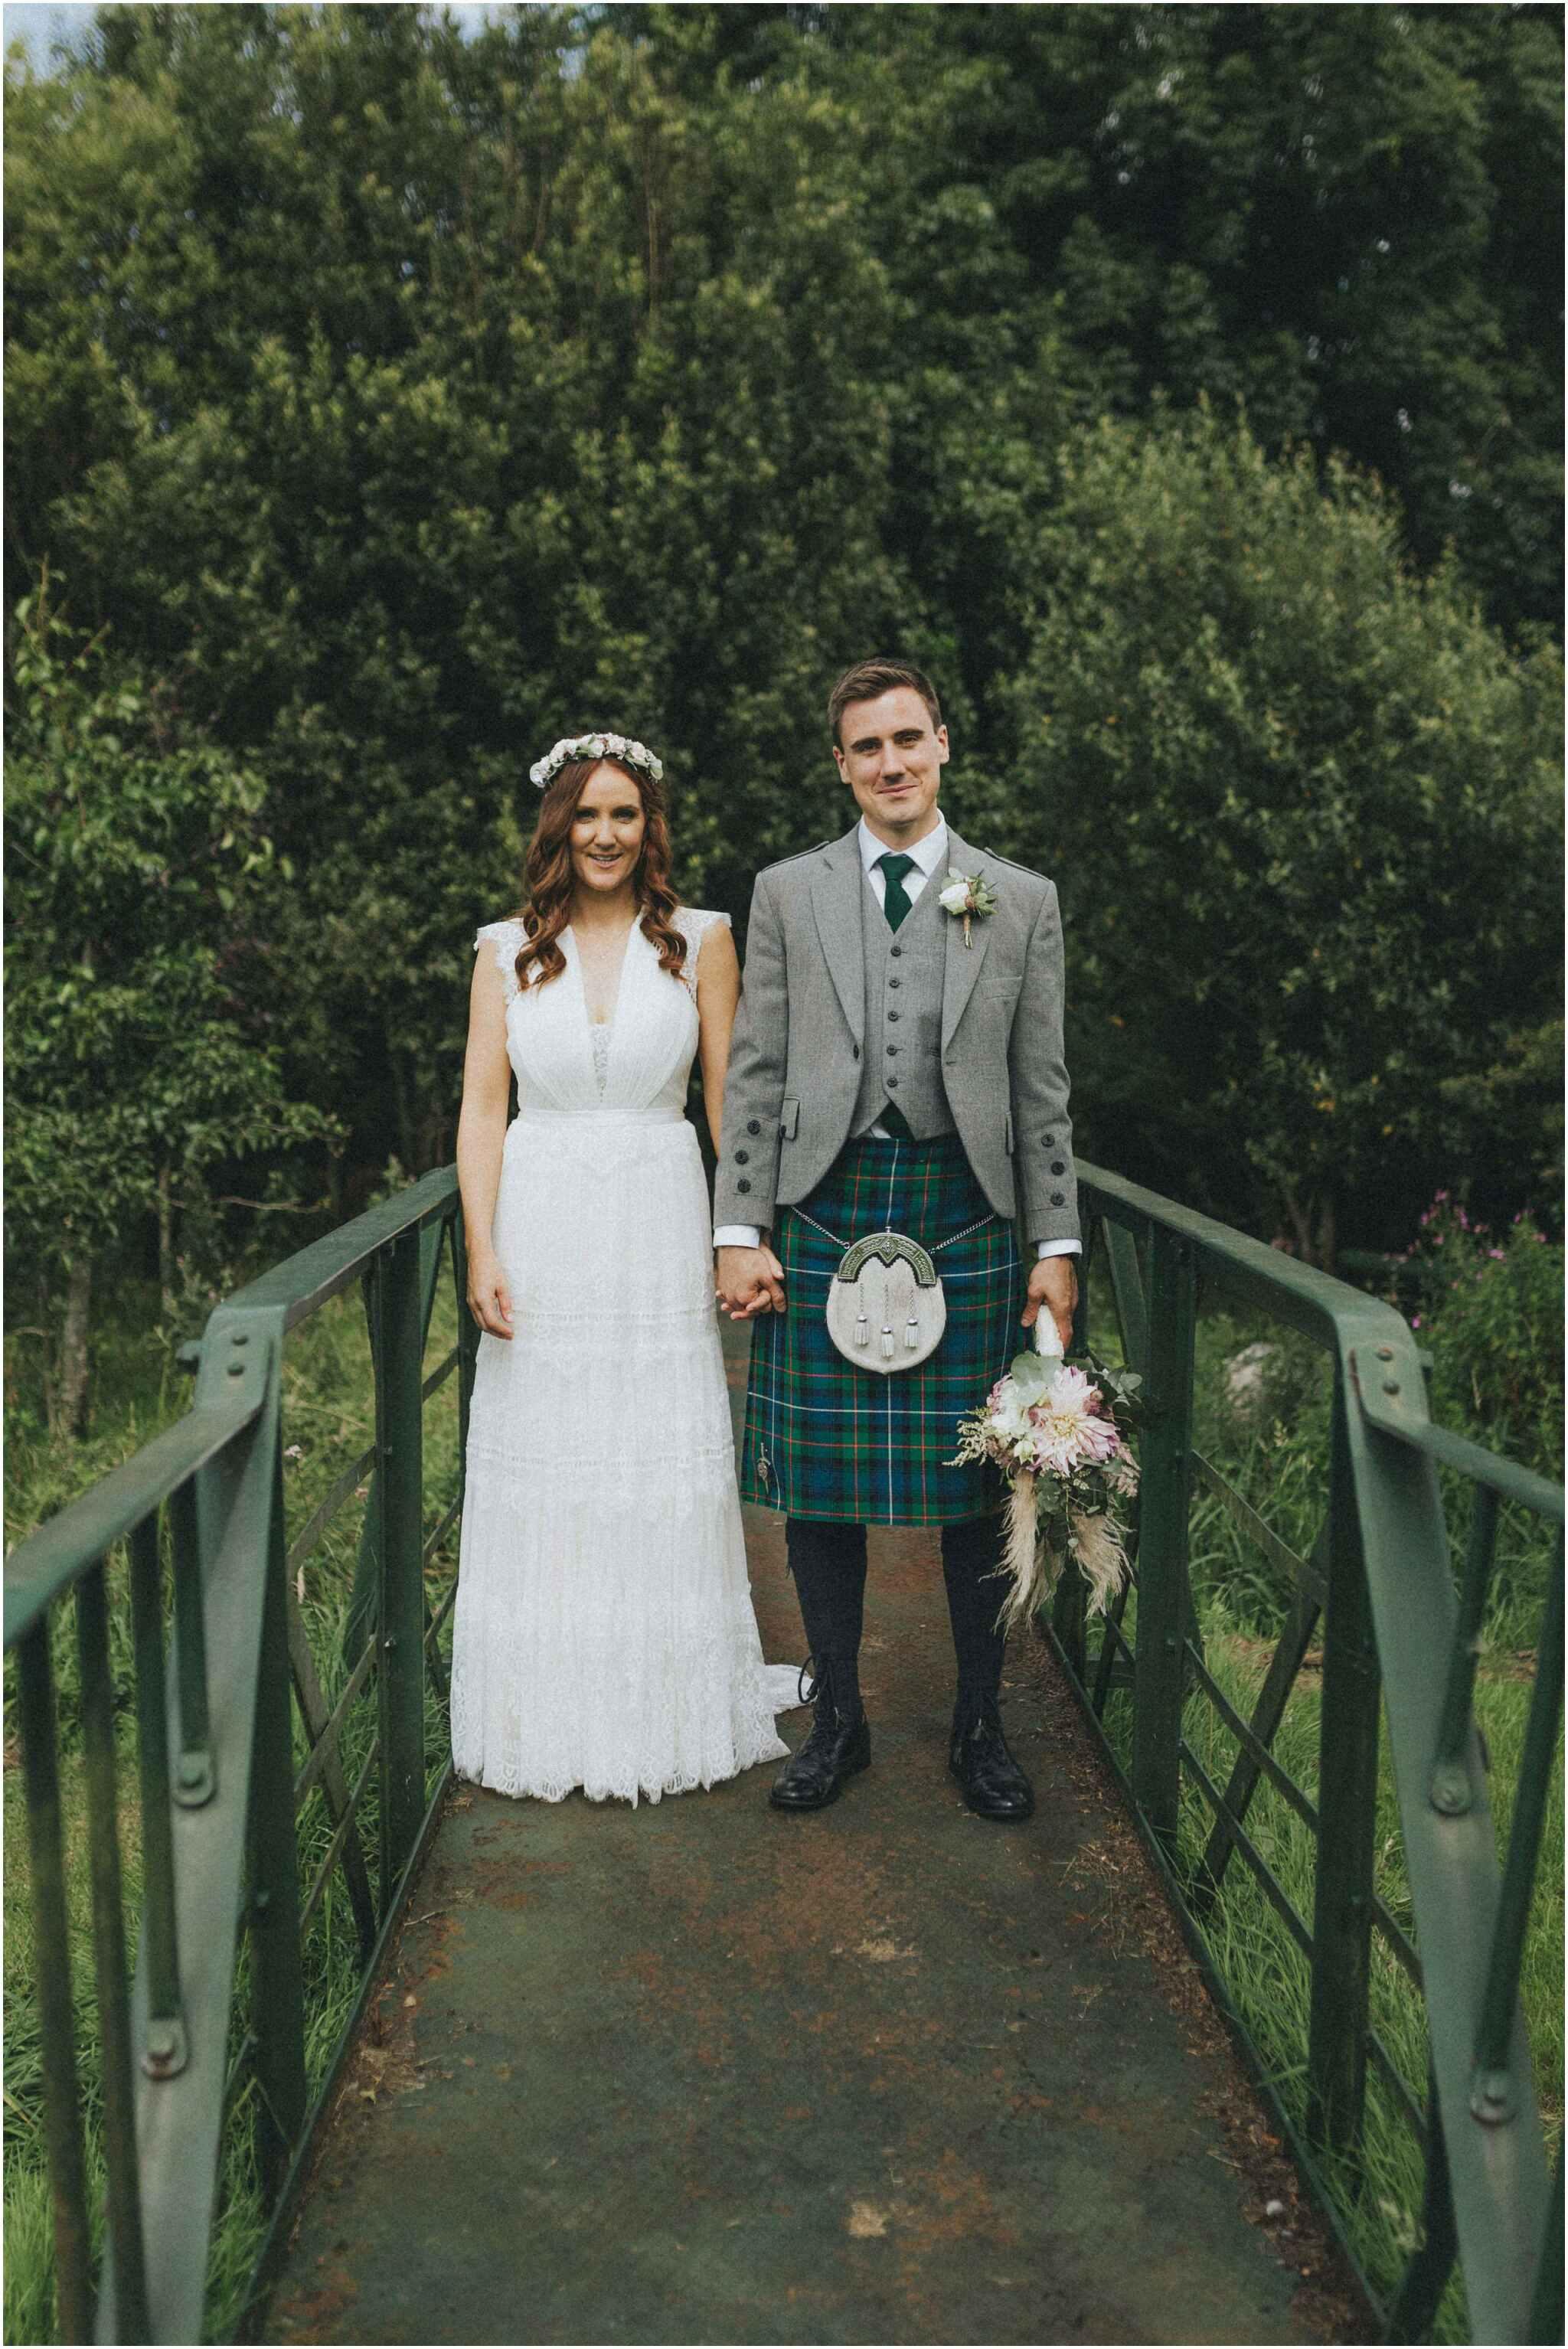 Fionnuala + Paul - Mount Druid Alternative Wedding 118